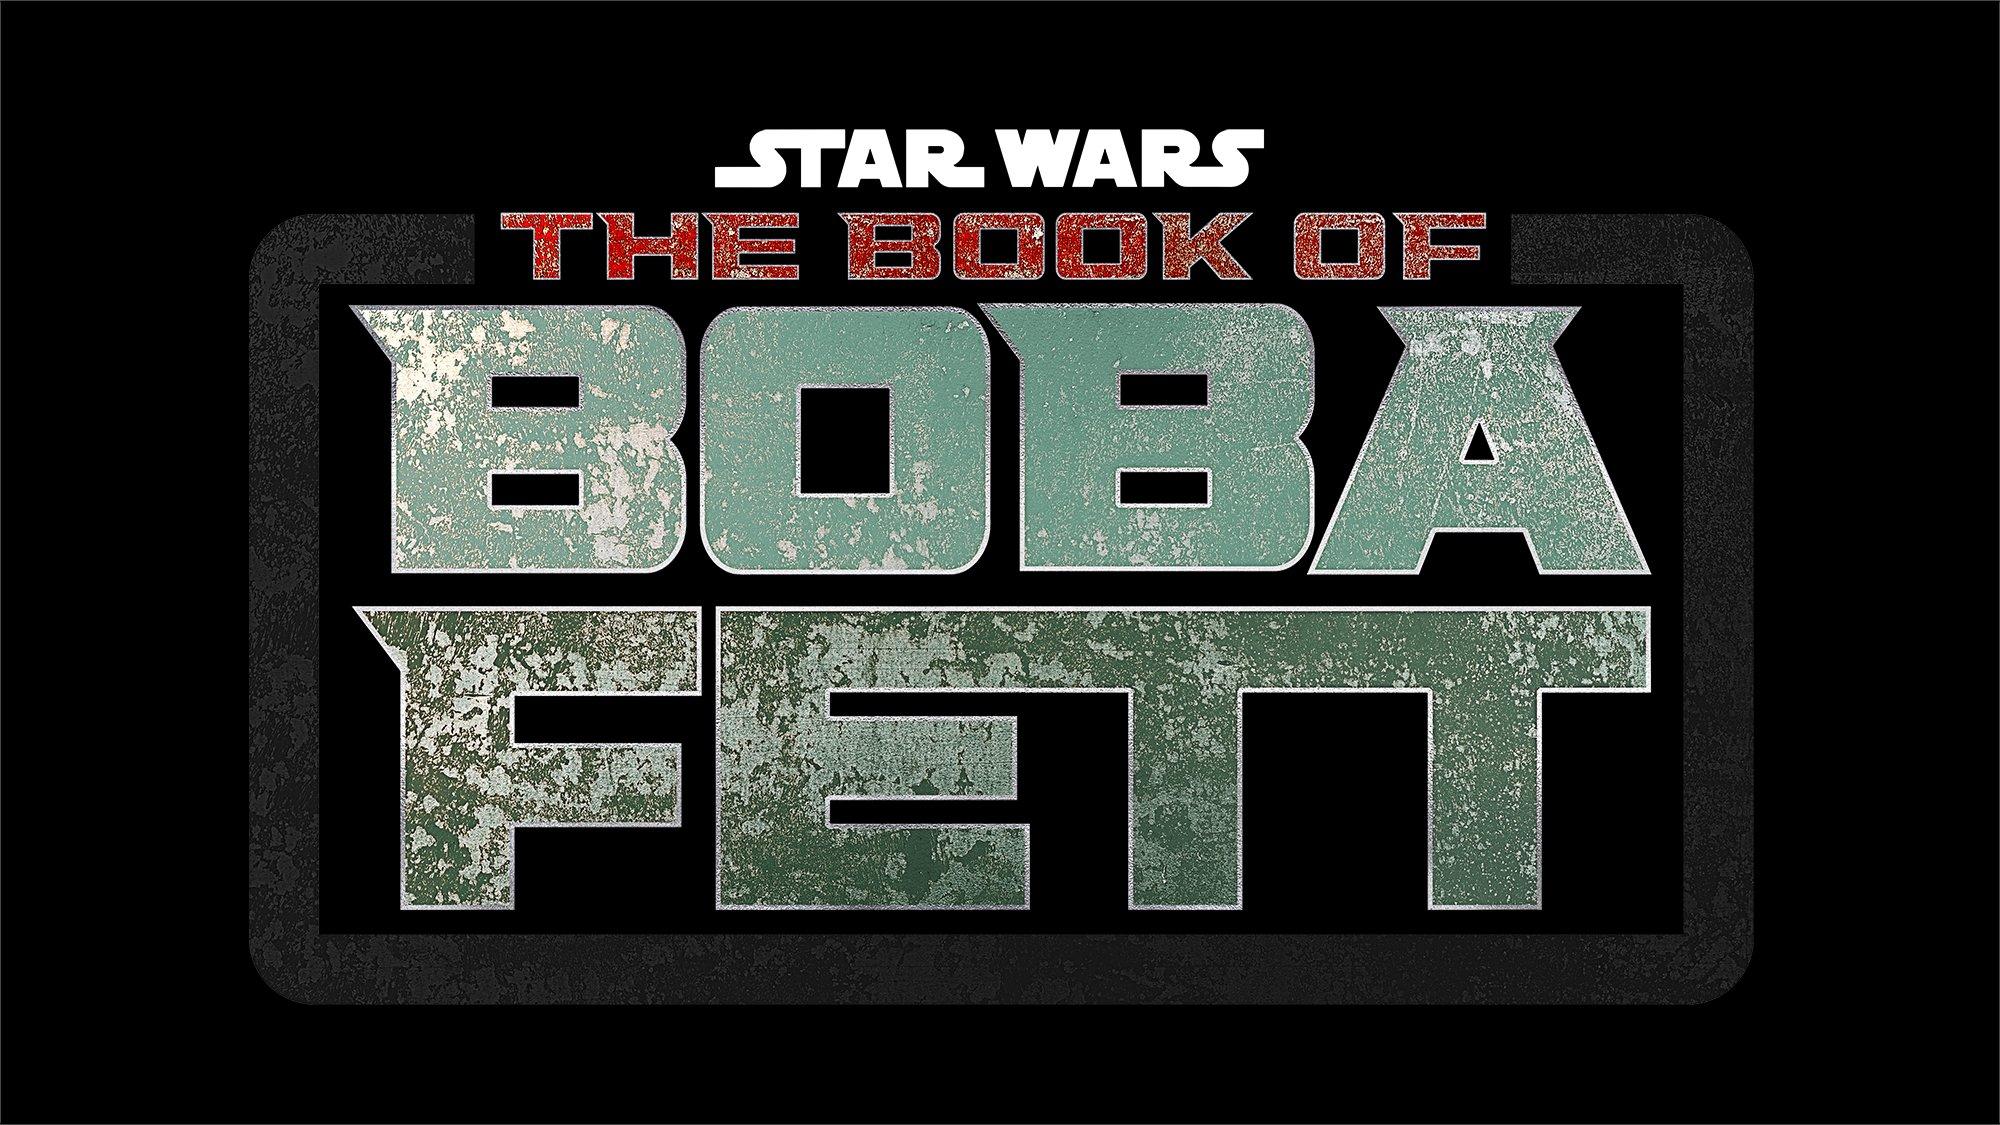 Star Wars The Book of Boba Fett: Does Disney Have Bigger Plans?